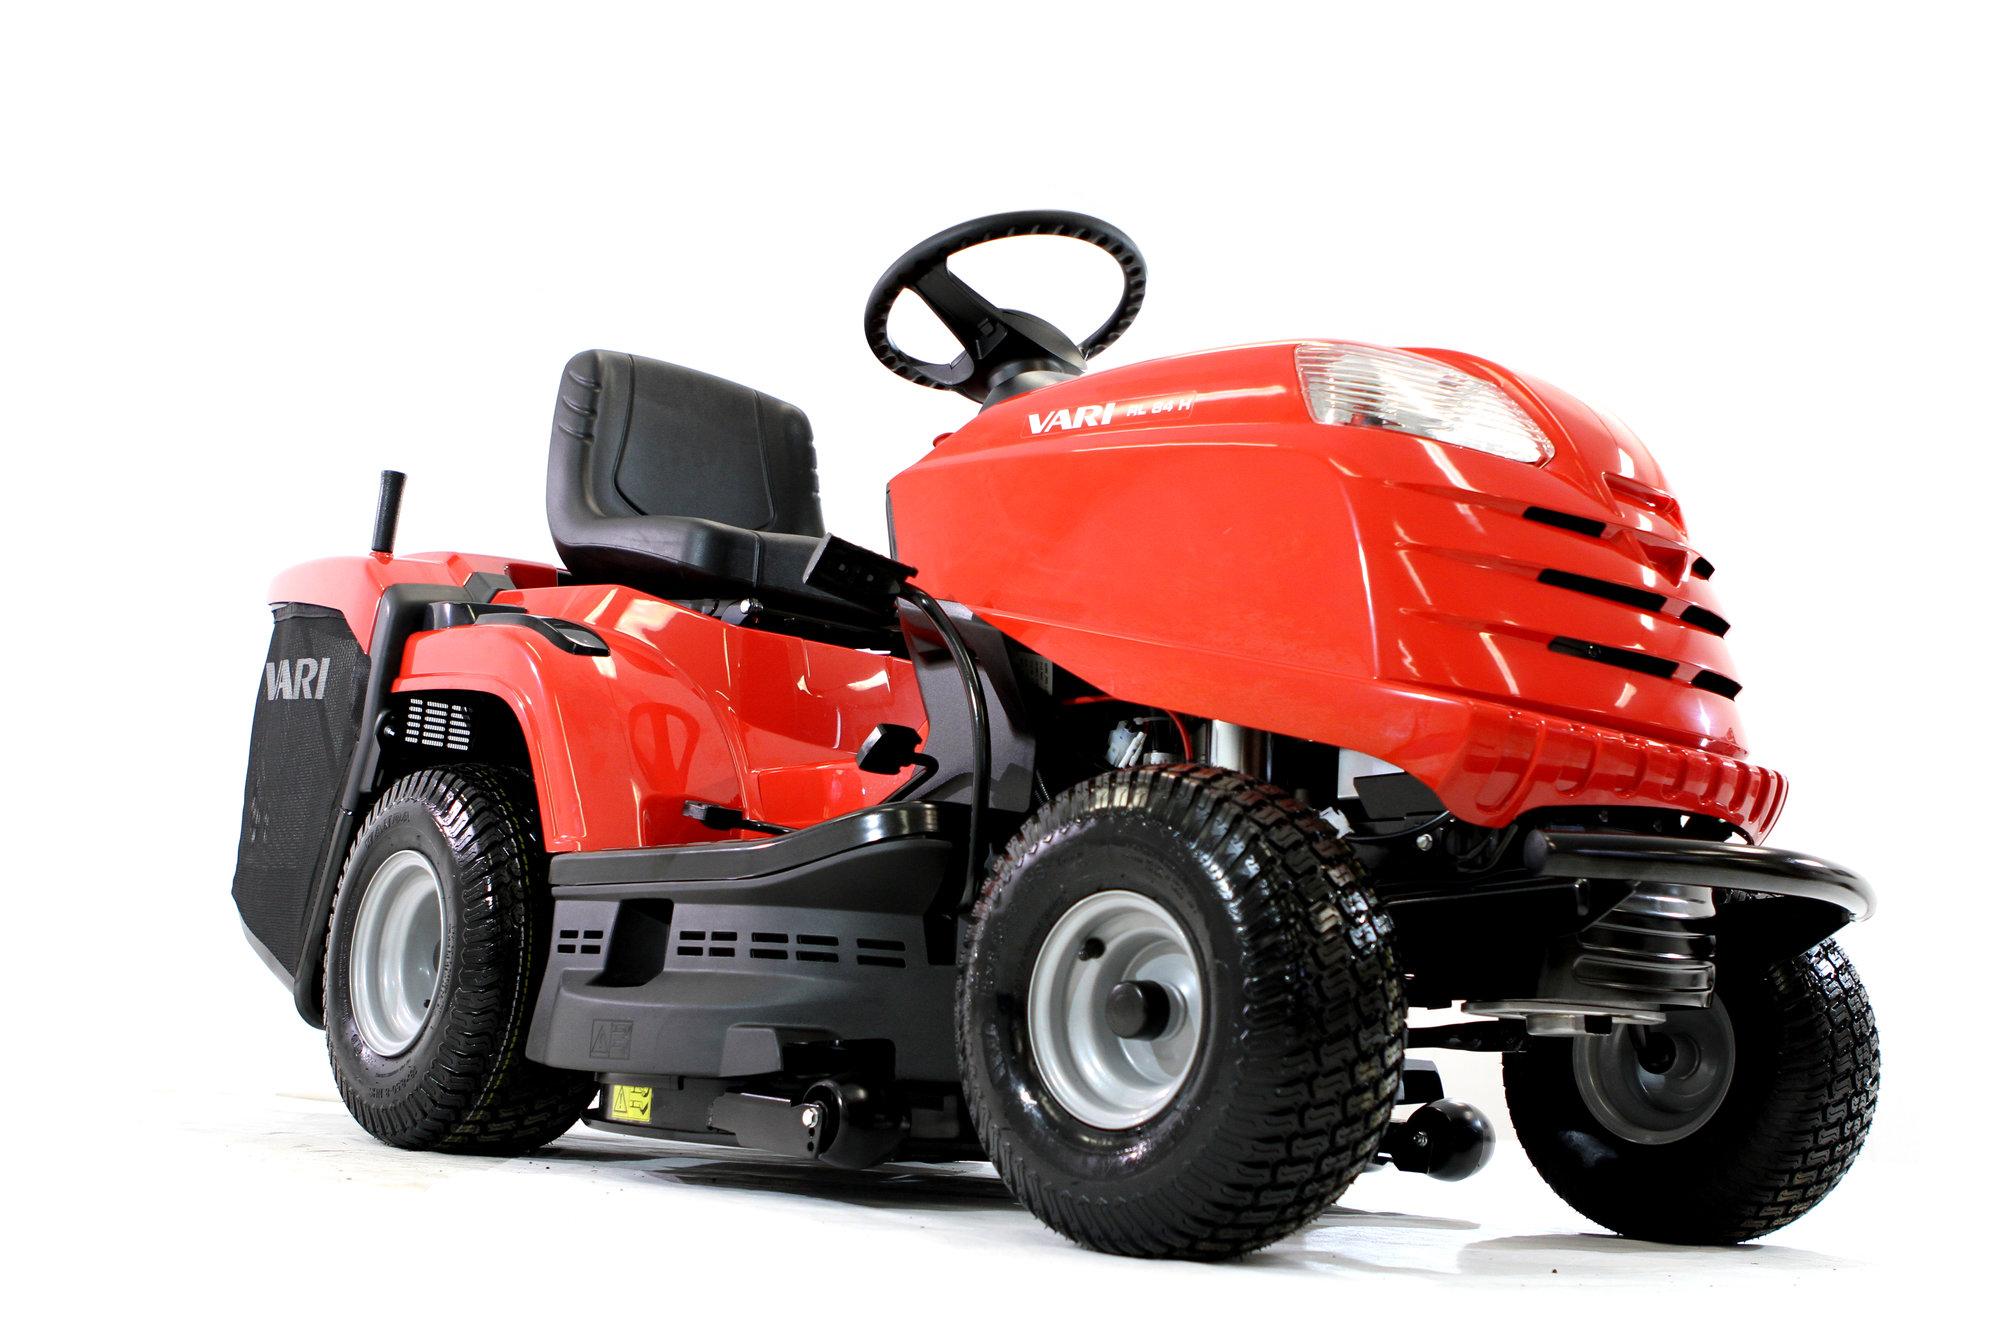 Travní traktor VARI RL 84 H